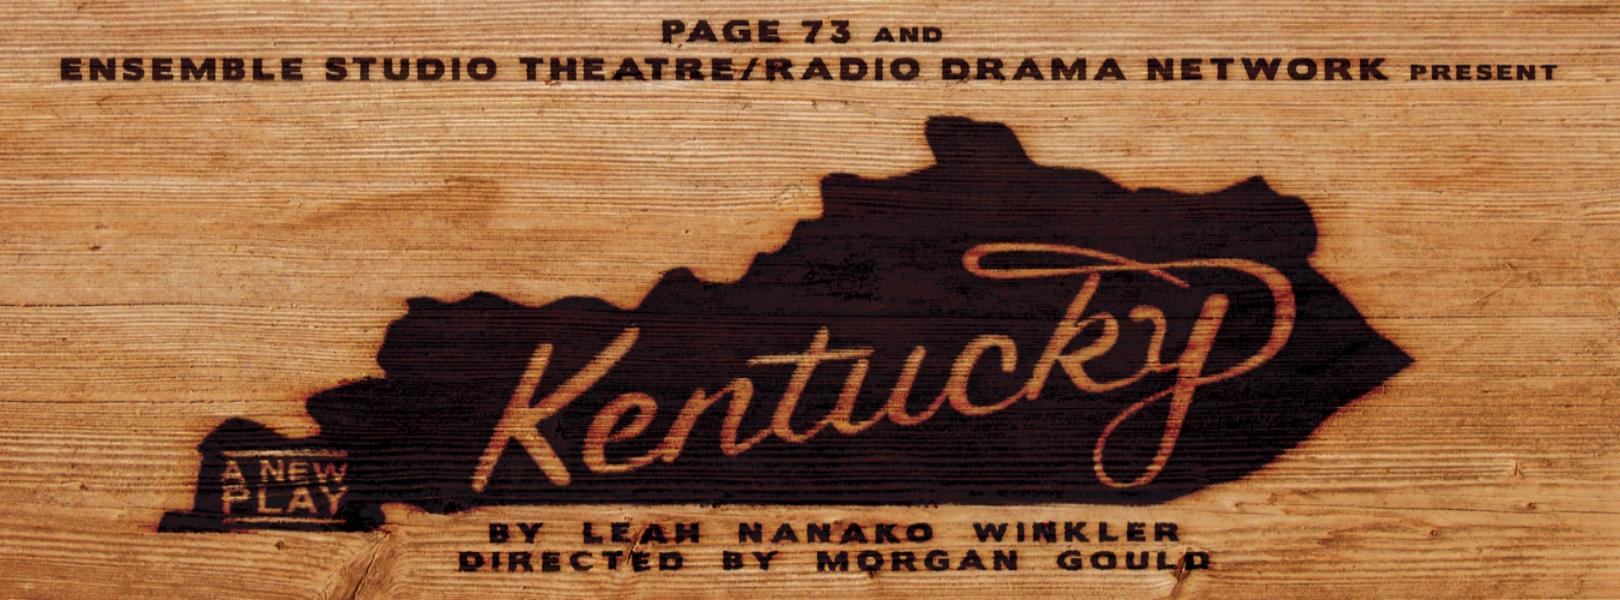 P73-Kentucky-Eblast-Artwork.jpg